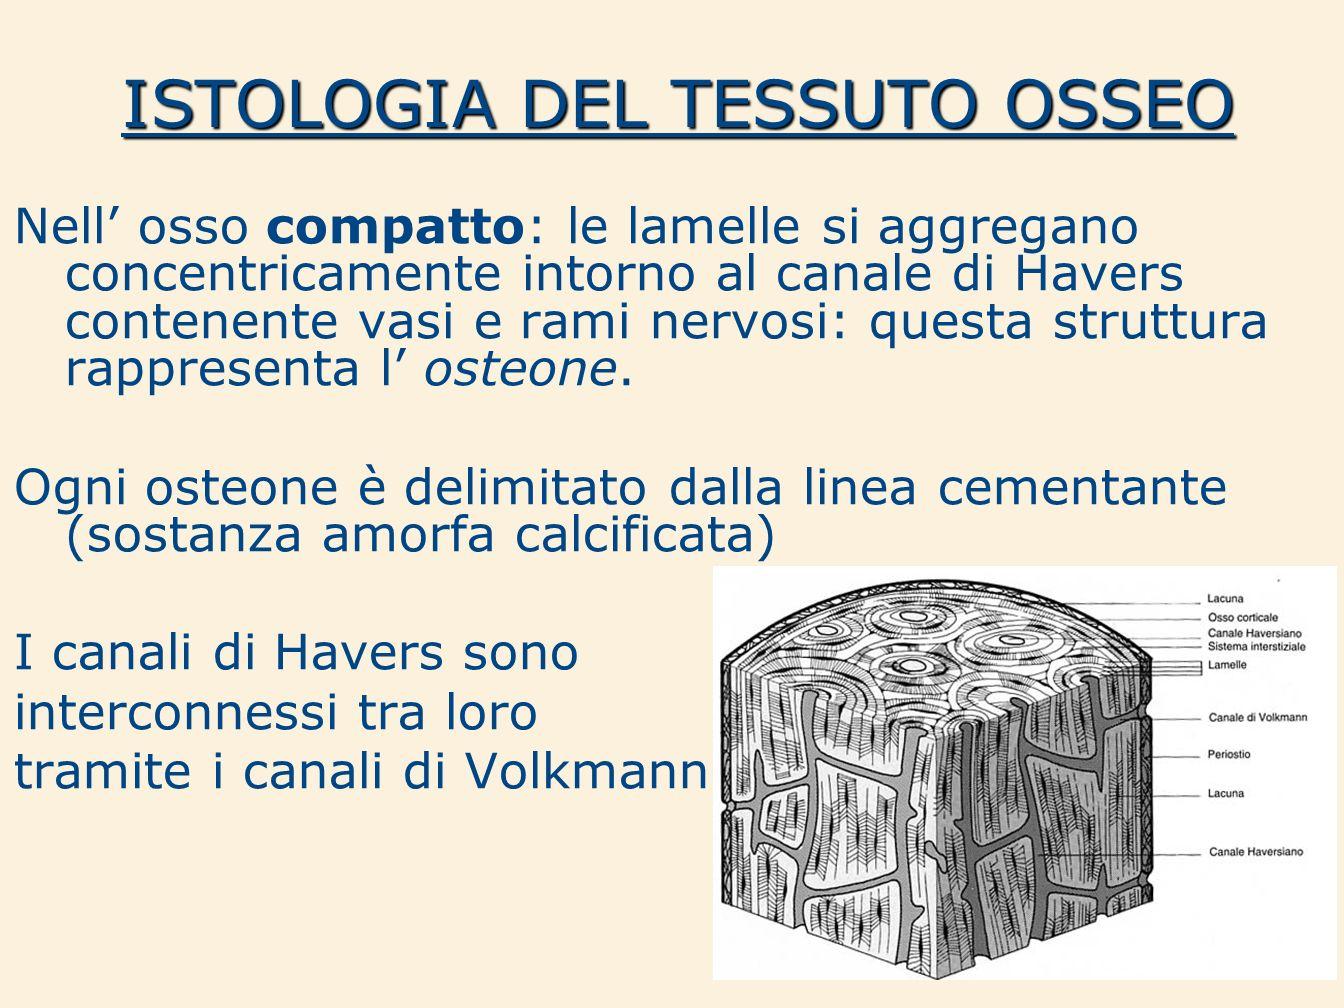 ISTOLOGIA DEL TESSUTO OSSEO